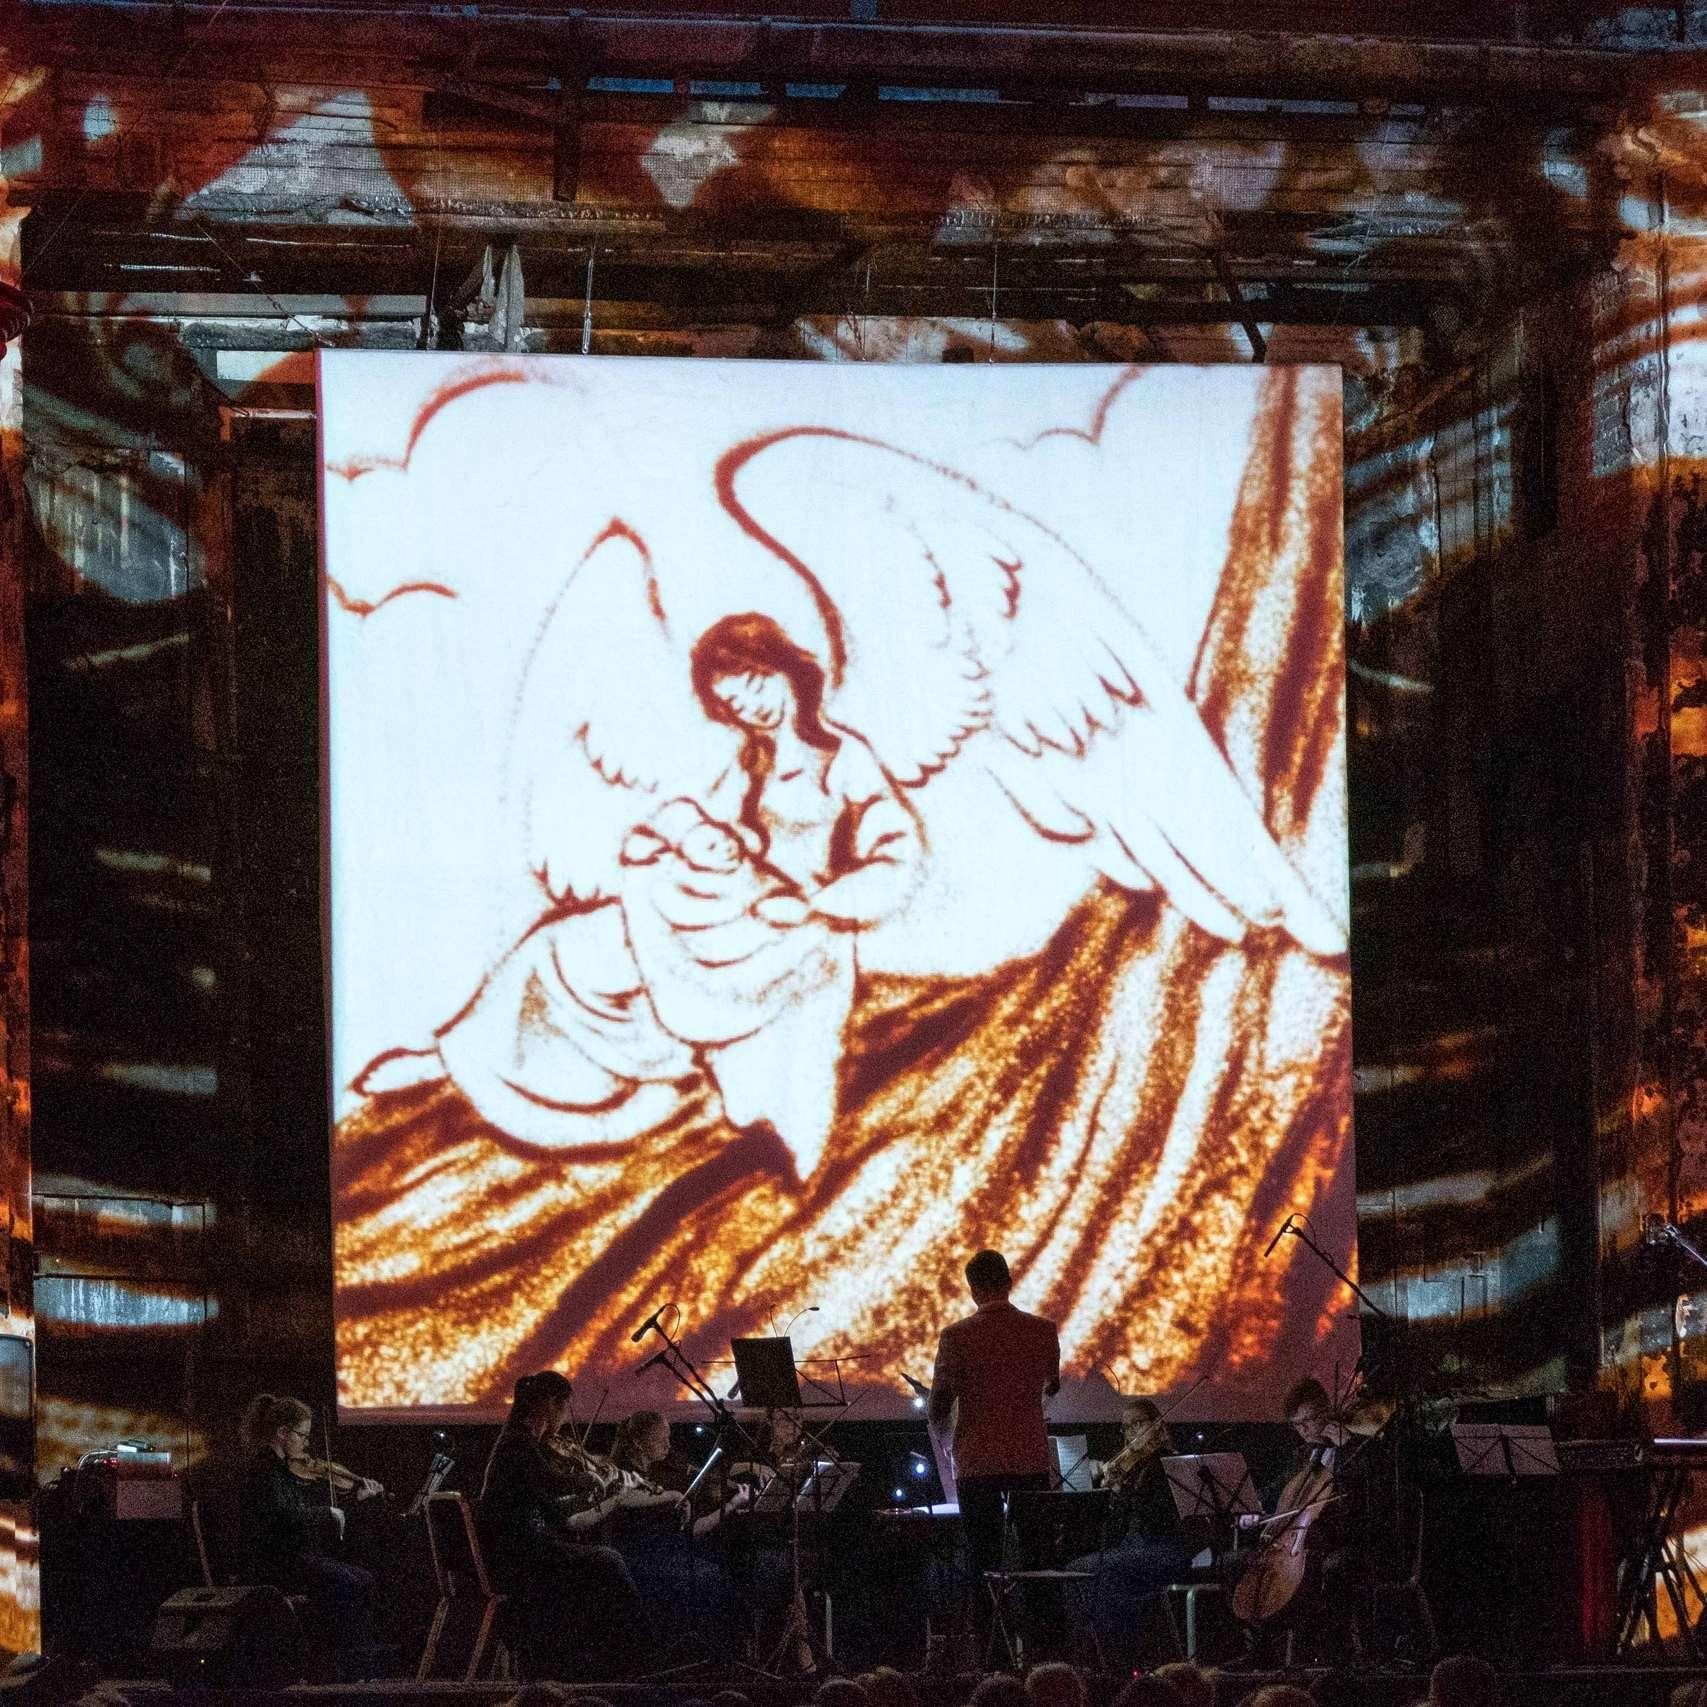 Концерт «Классика на песке. Моцарт и Бах» со скидкой 37%